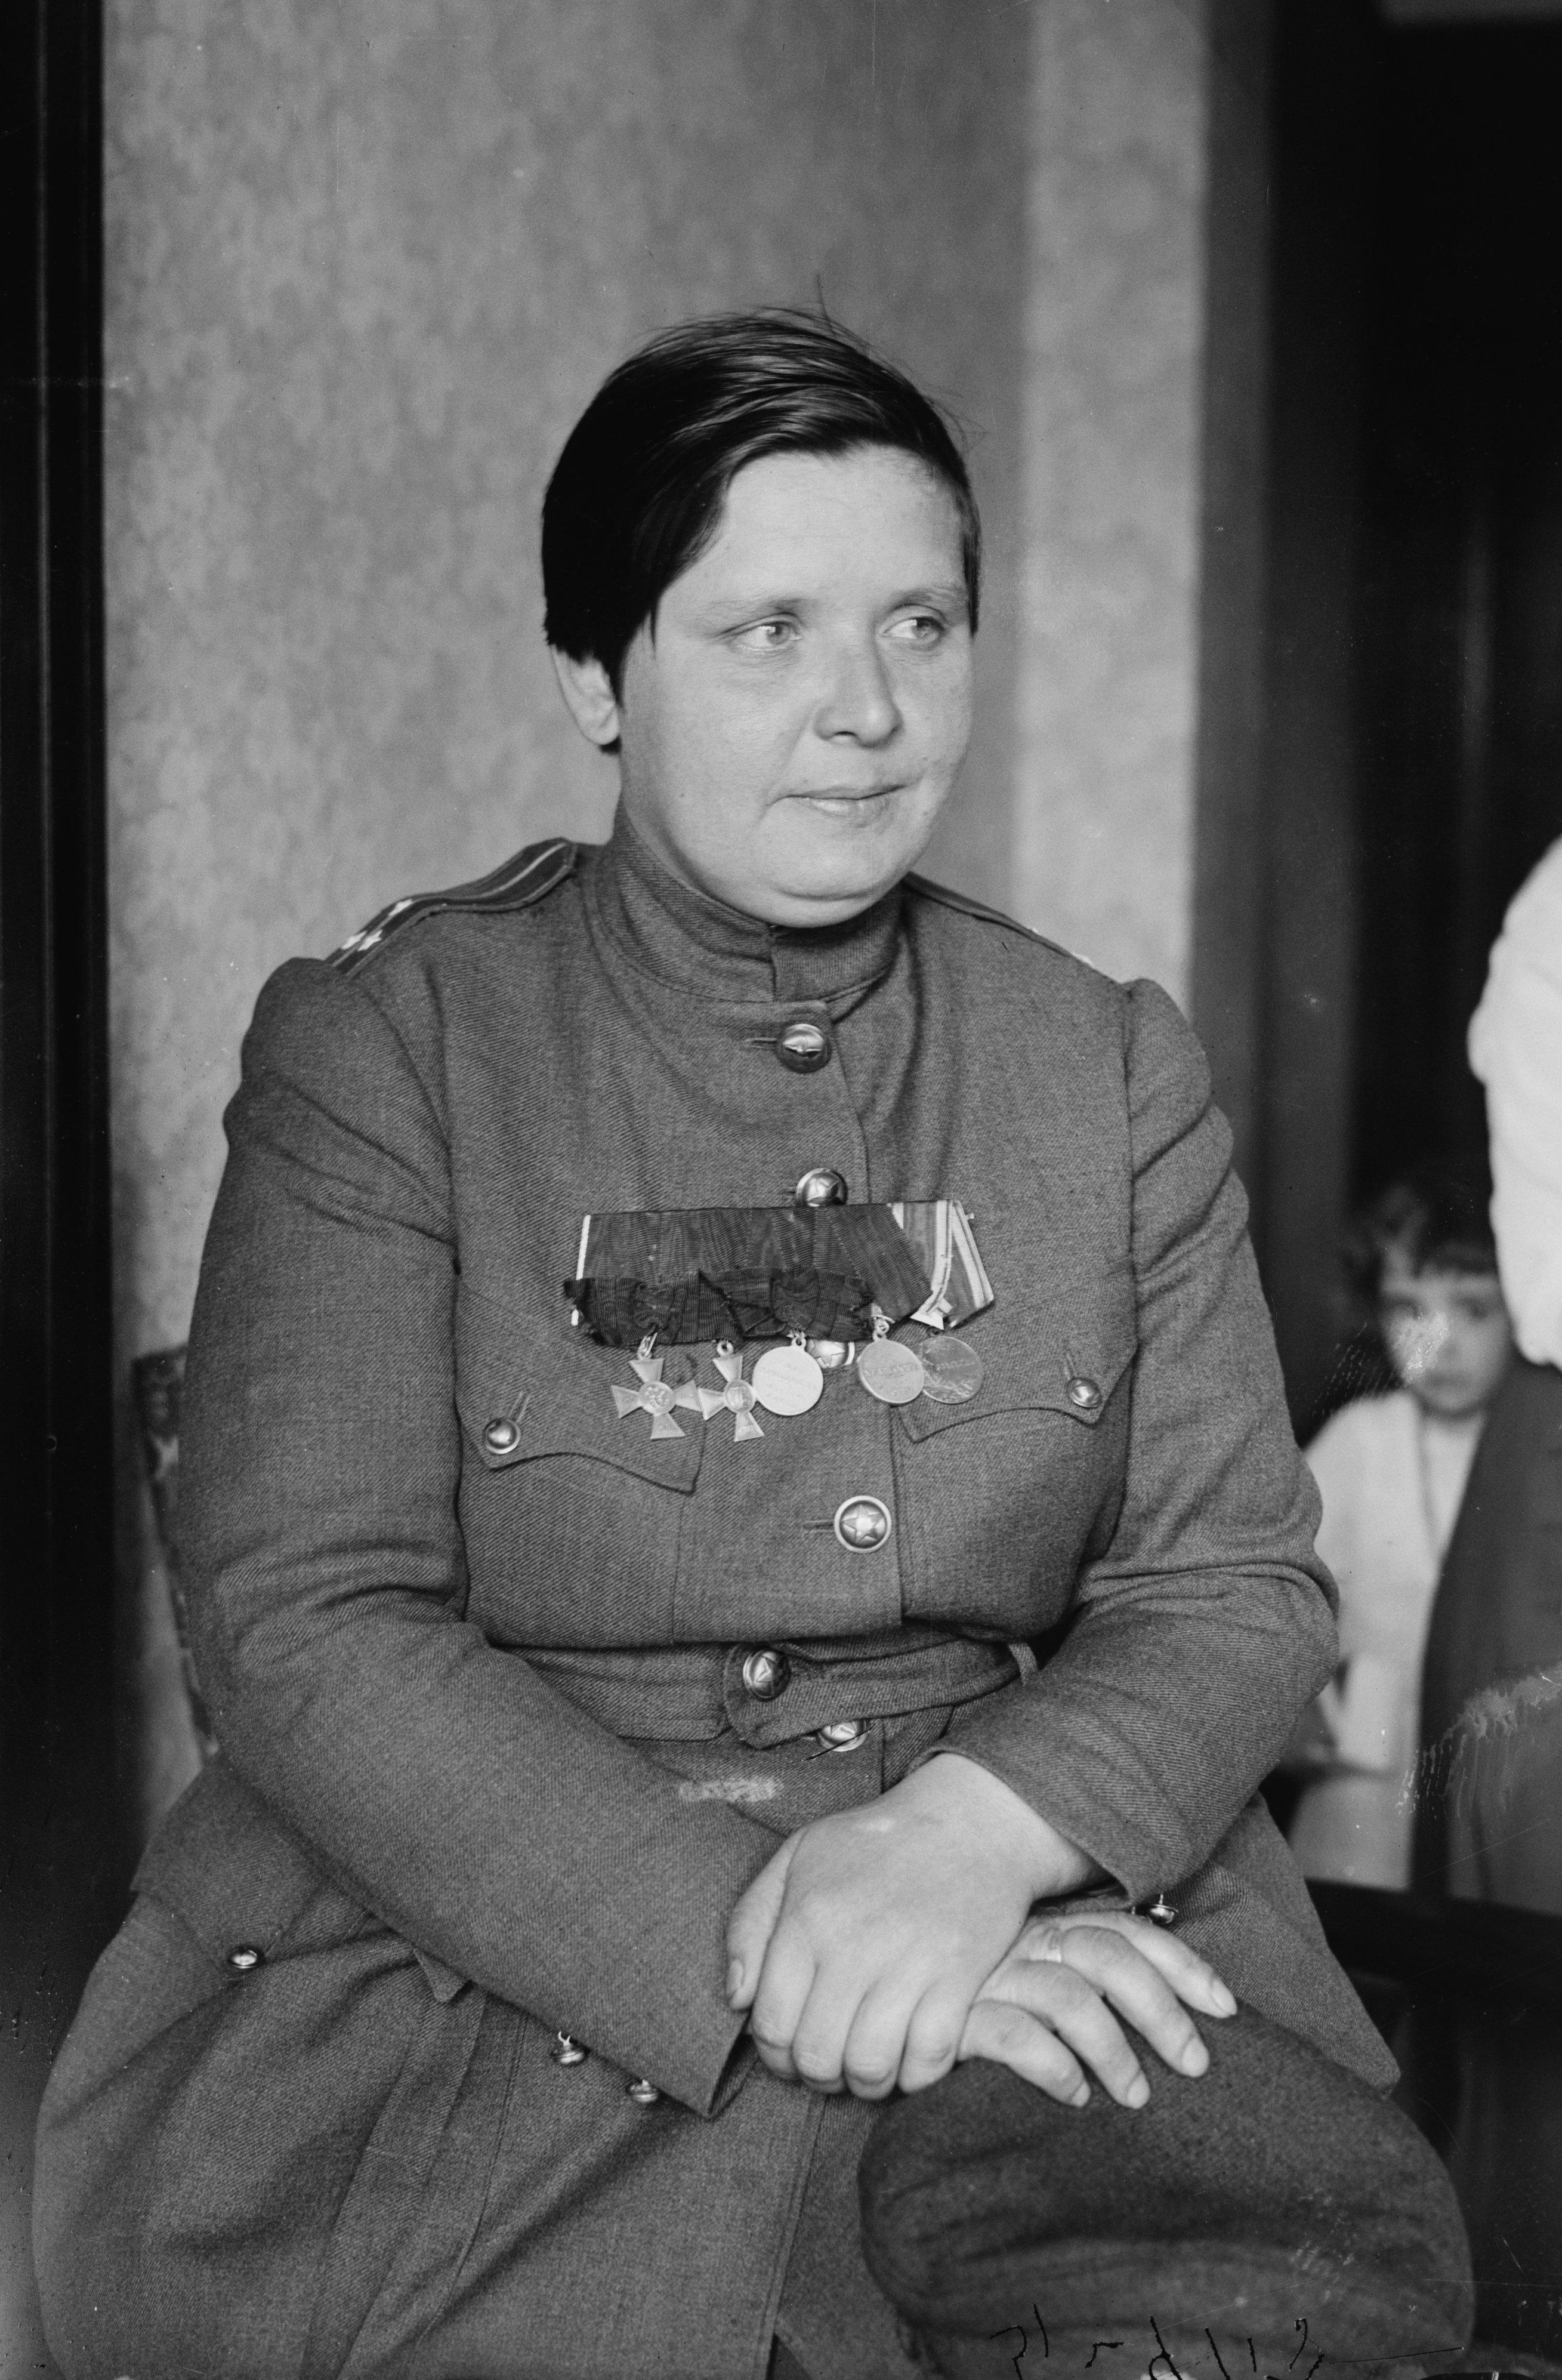 http://upload.wikimedia.org/wikipedia/commons/1/1d/Bochkareva_Maria_LOC_ggbain_26866.jpg